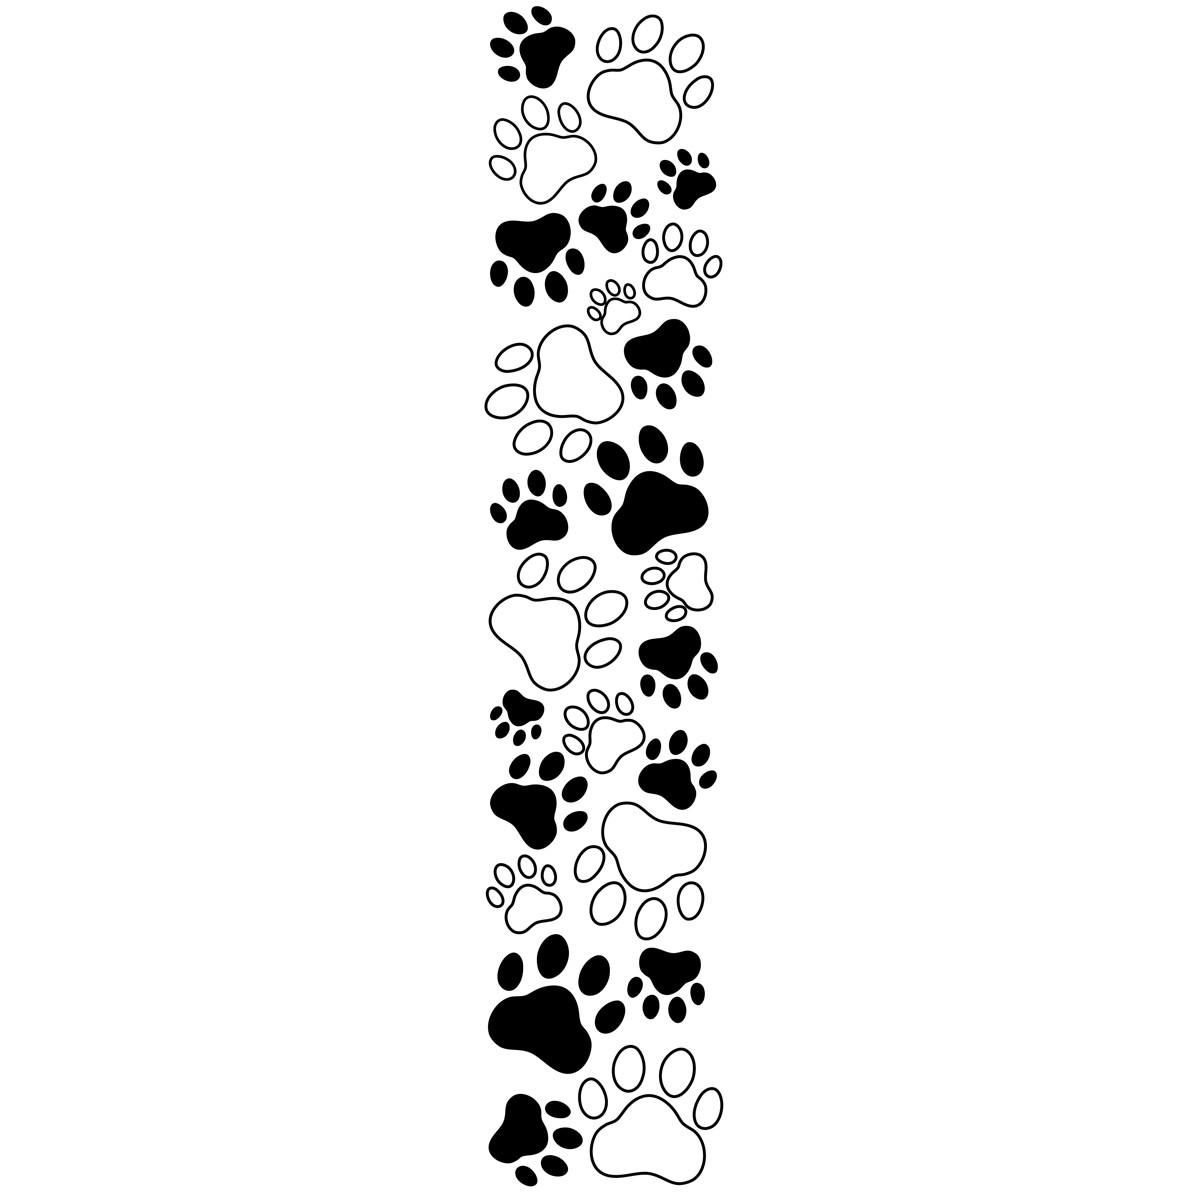 Bones clipart paw print Paw Images Info Free Print